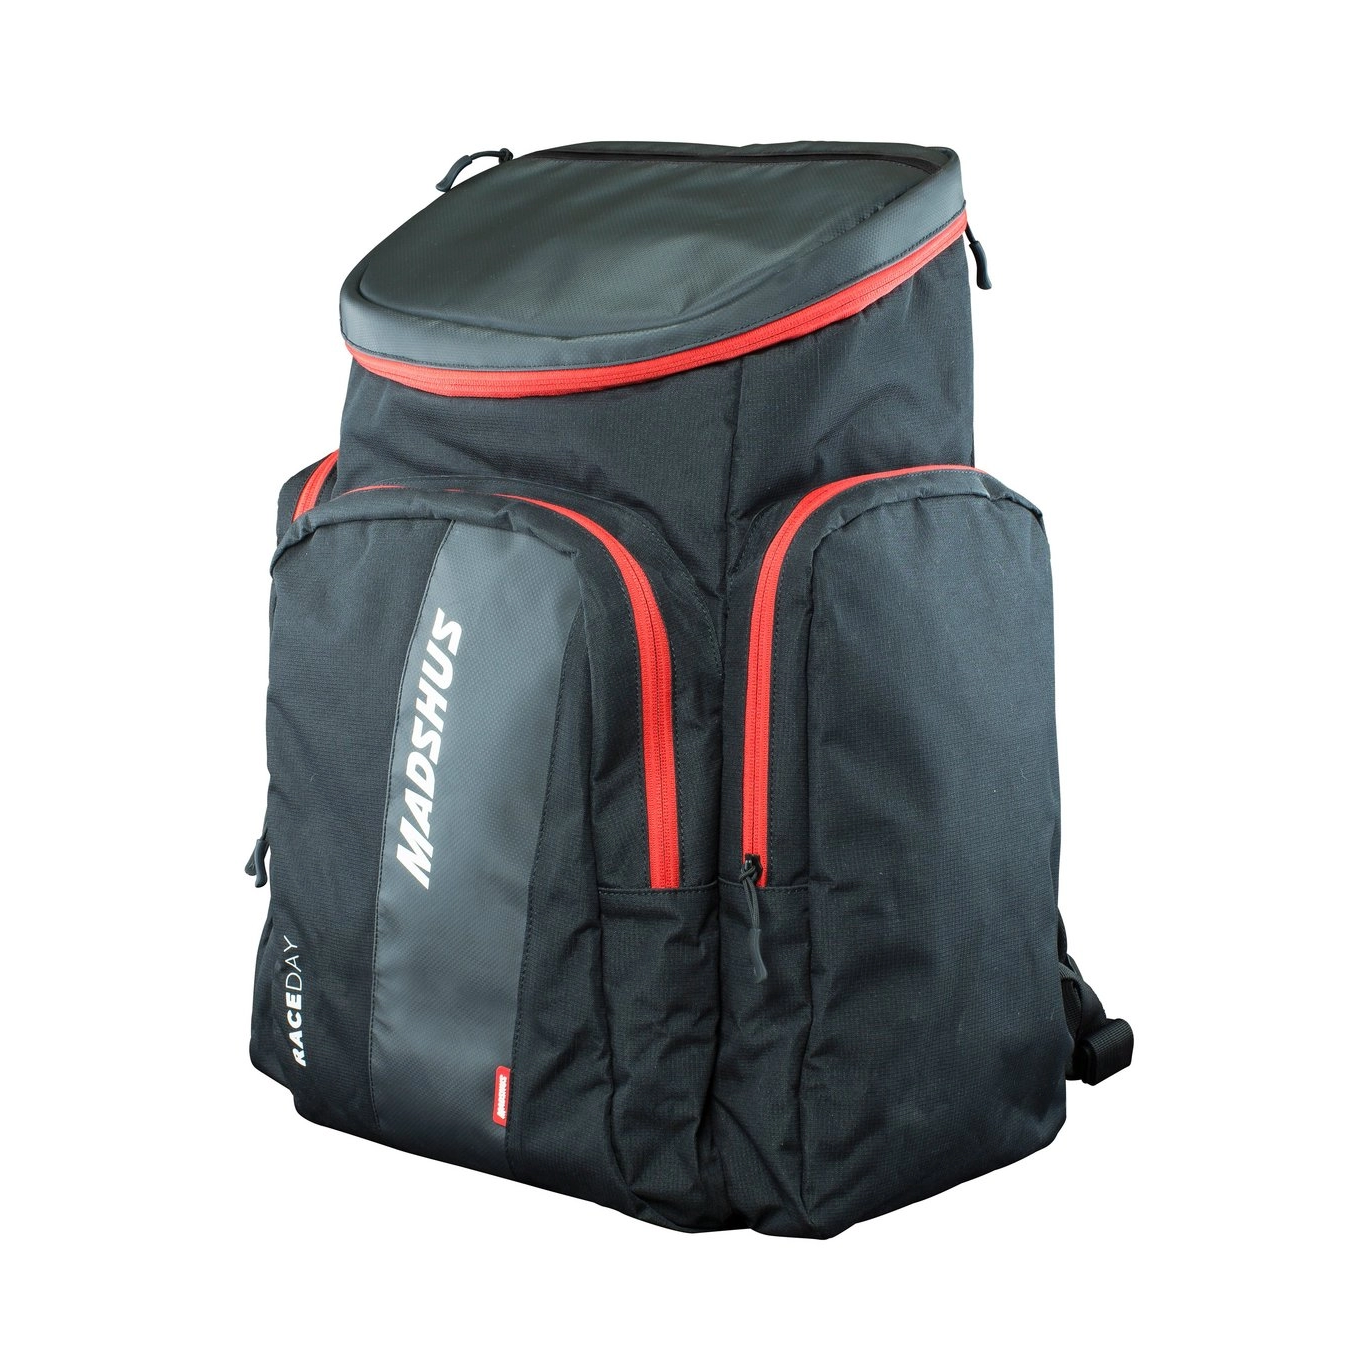 Madshus Madshus Race Day Backpack